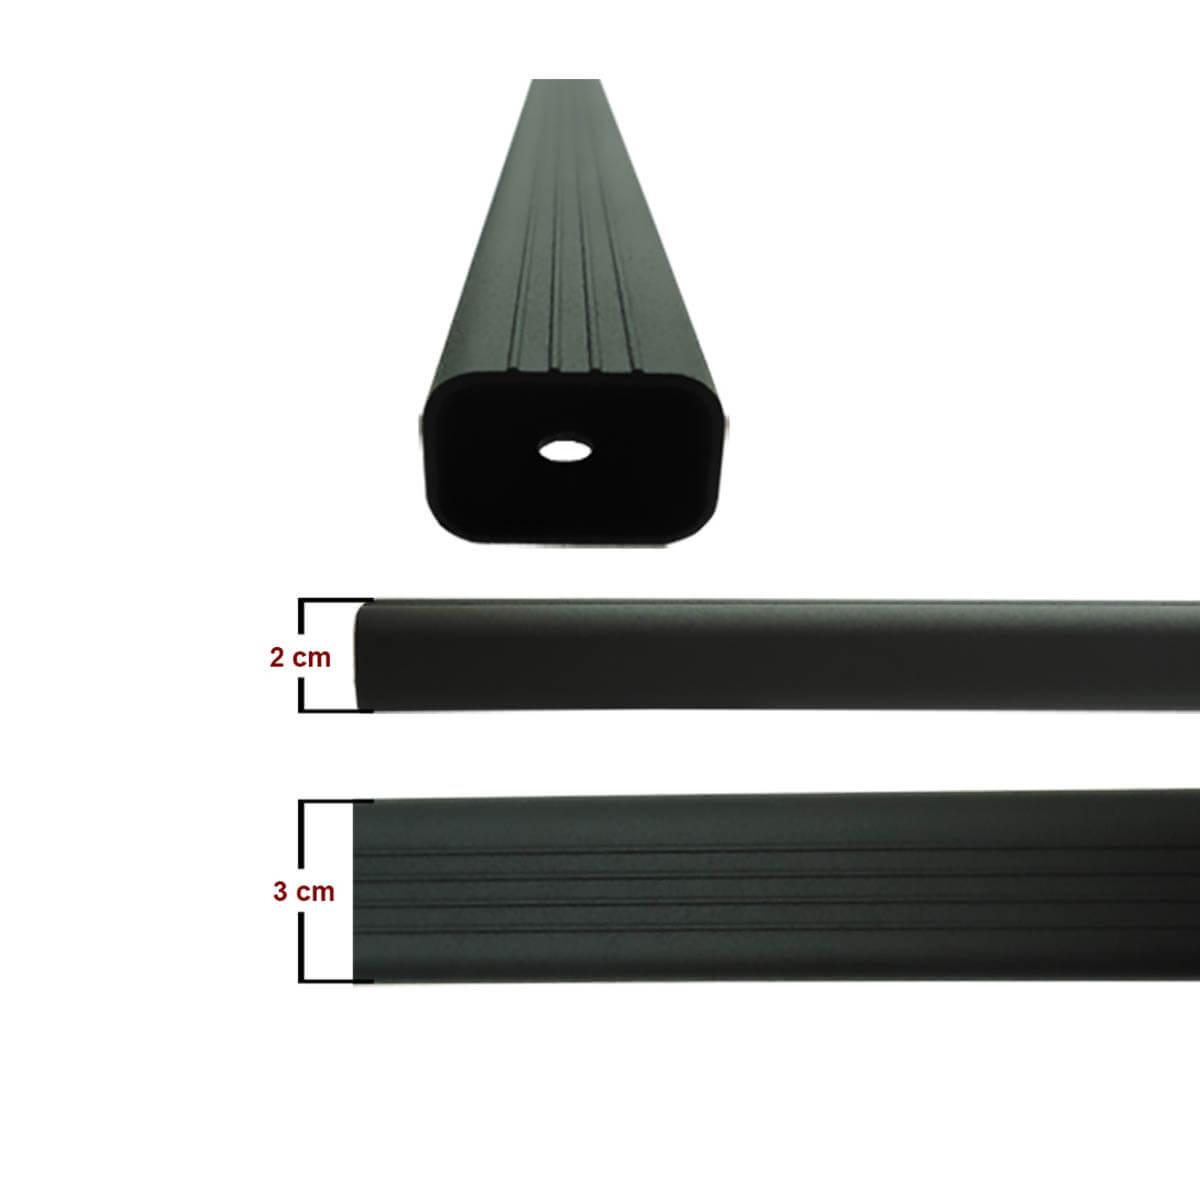 Travessa rack de teto alumínio preta Spacefox 2006 a 2018 ou Space Cross 2012 a 2018 kit 3 peças